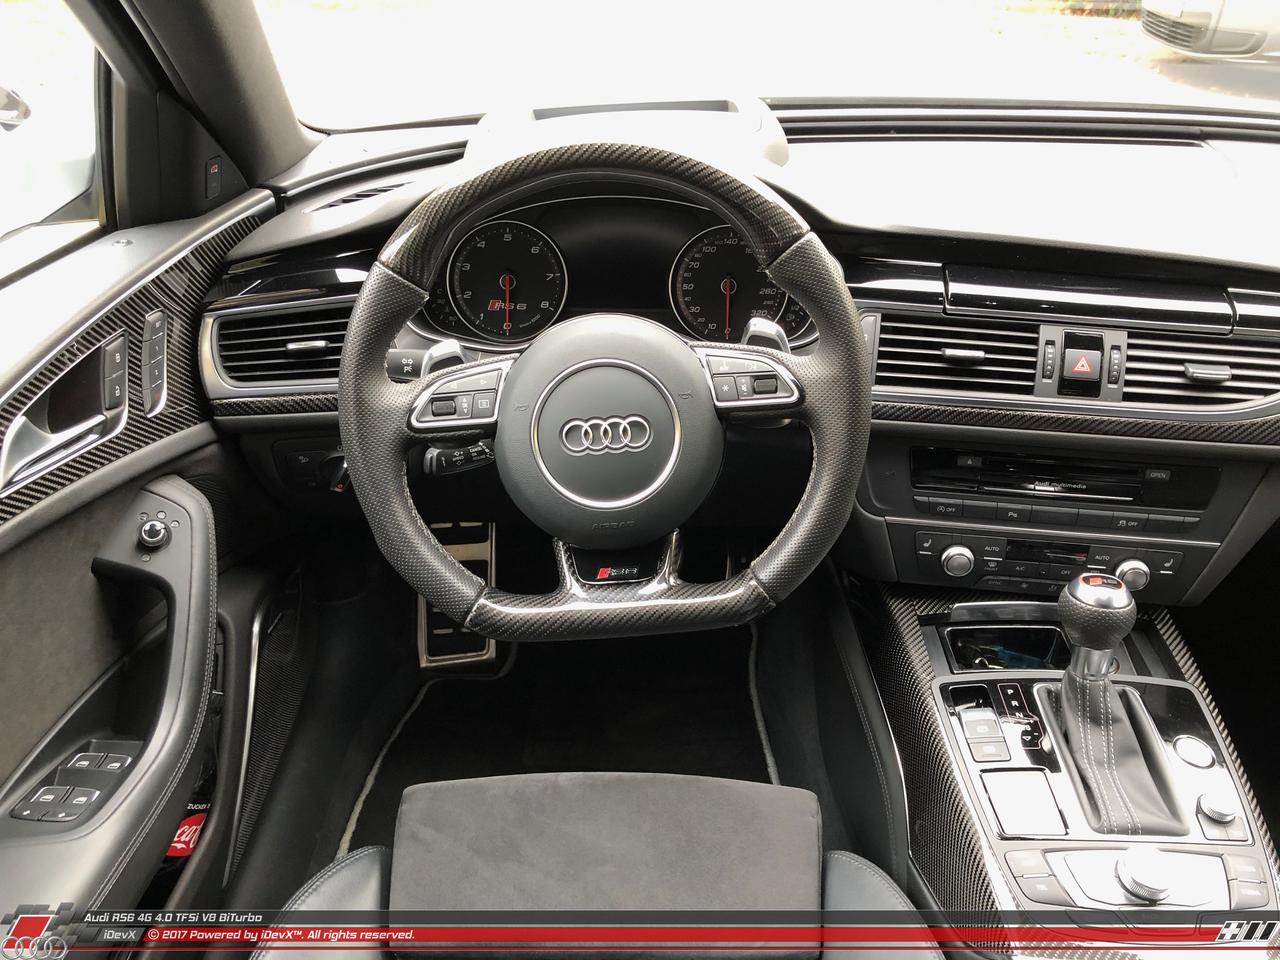 10_11.2018_Audi-RS6_iDevX_010.png